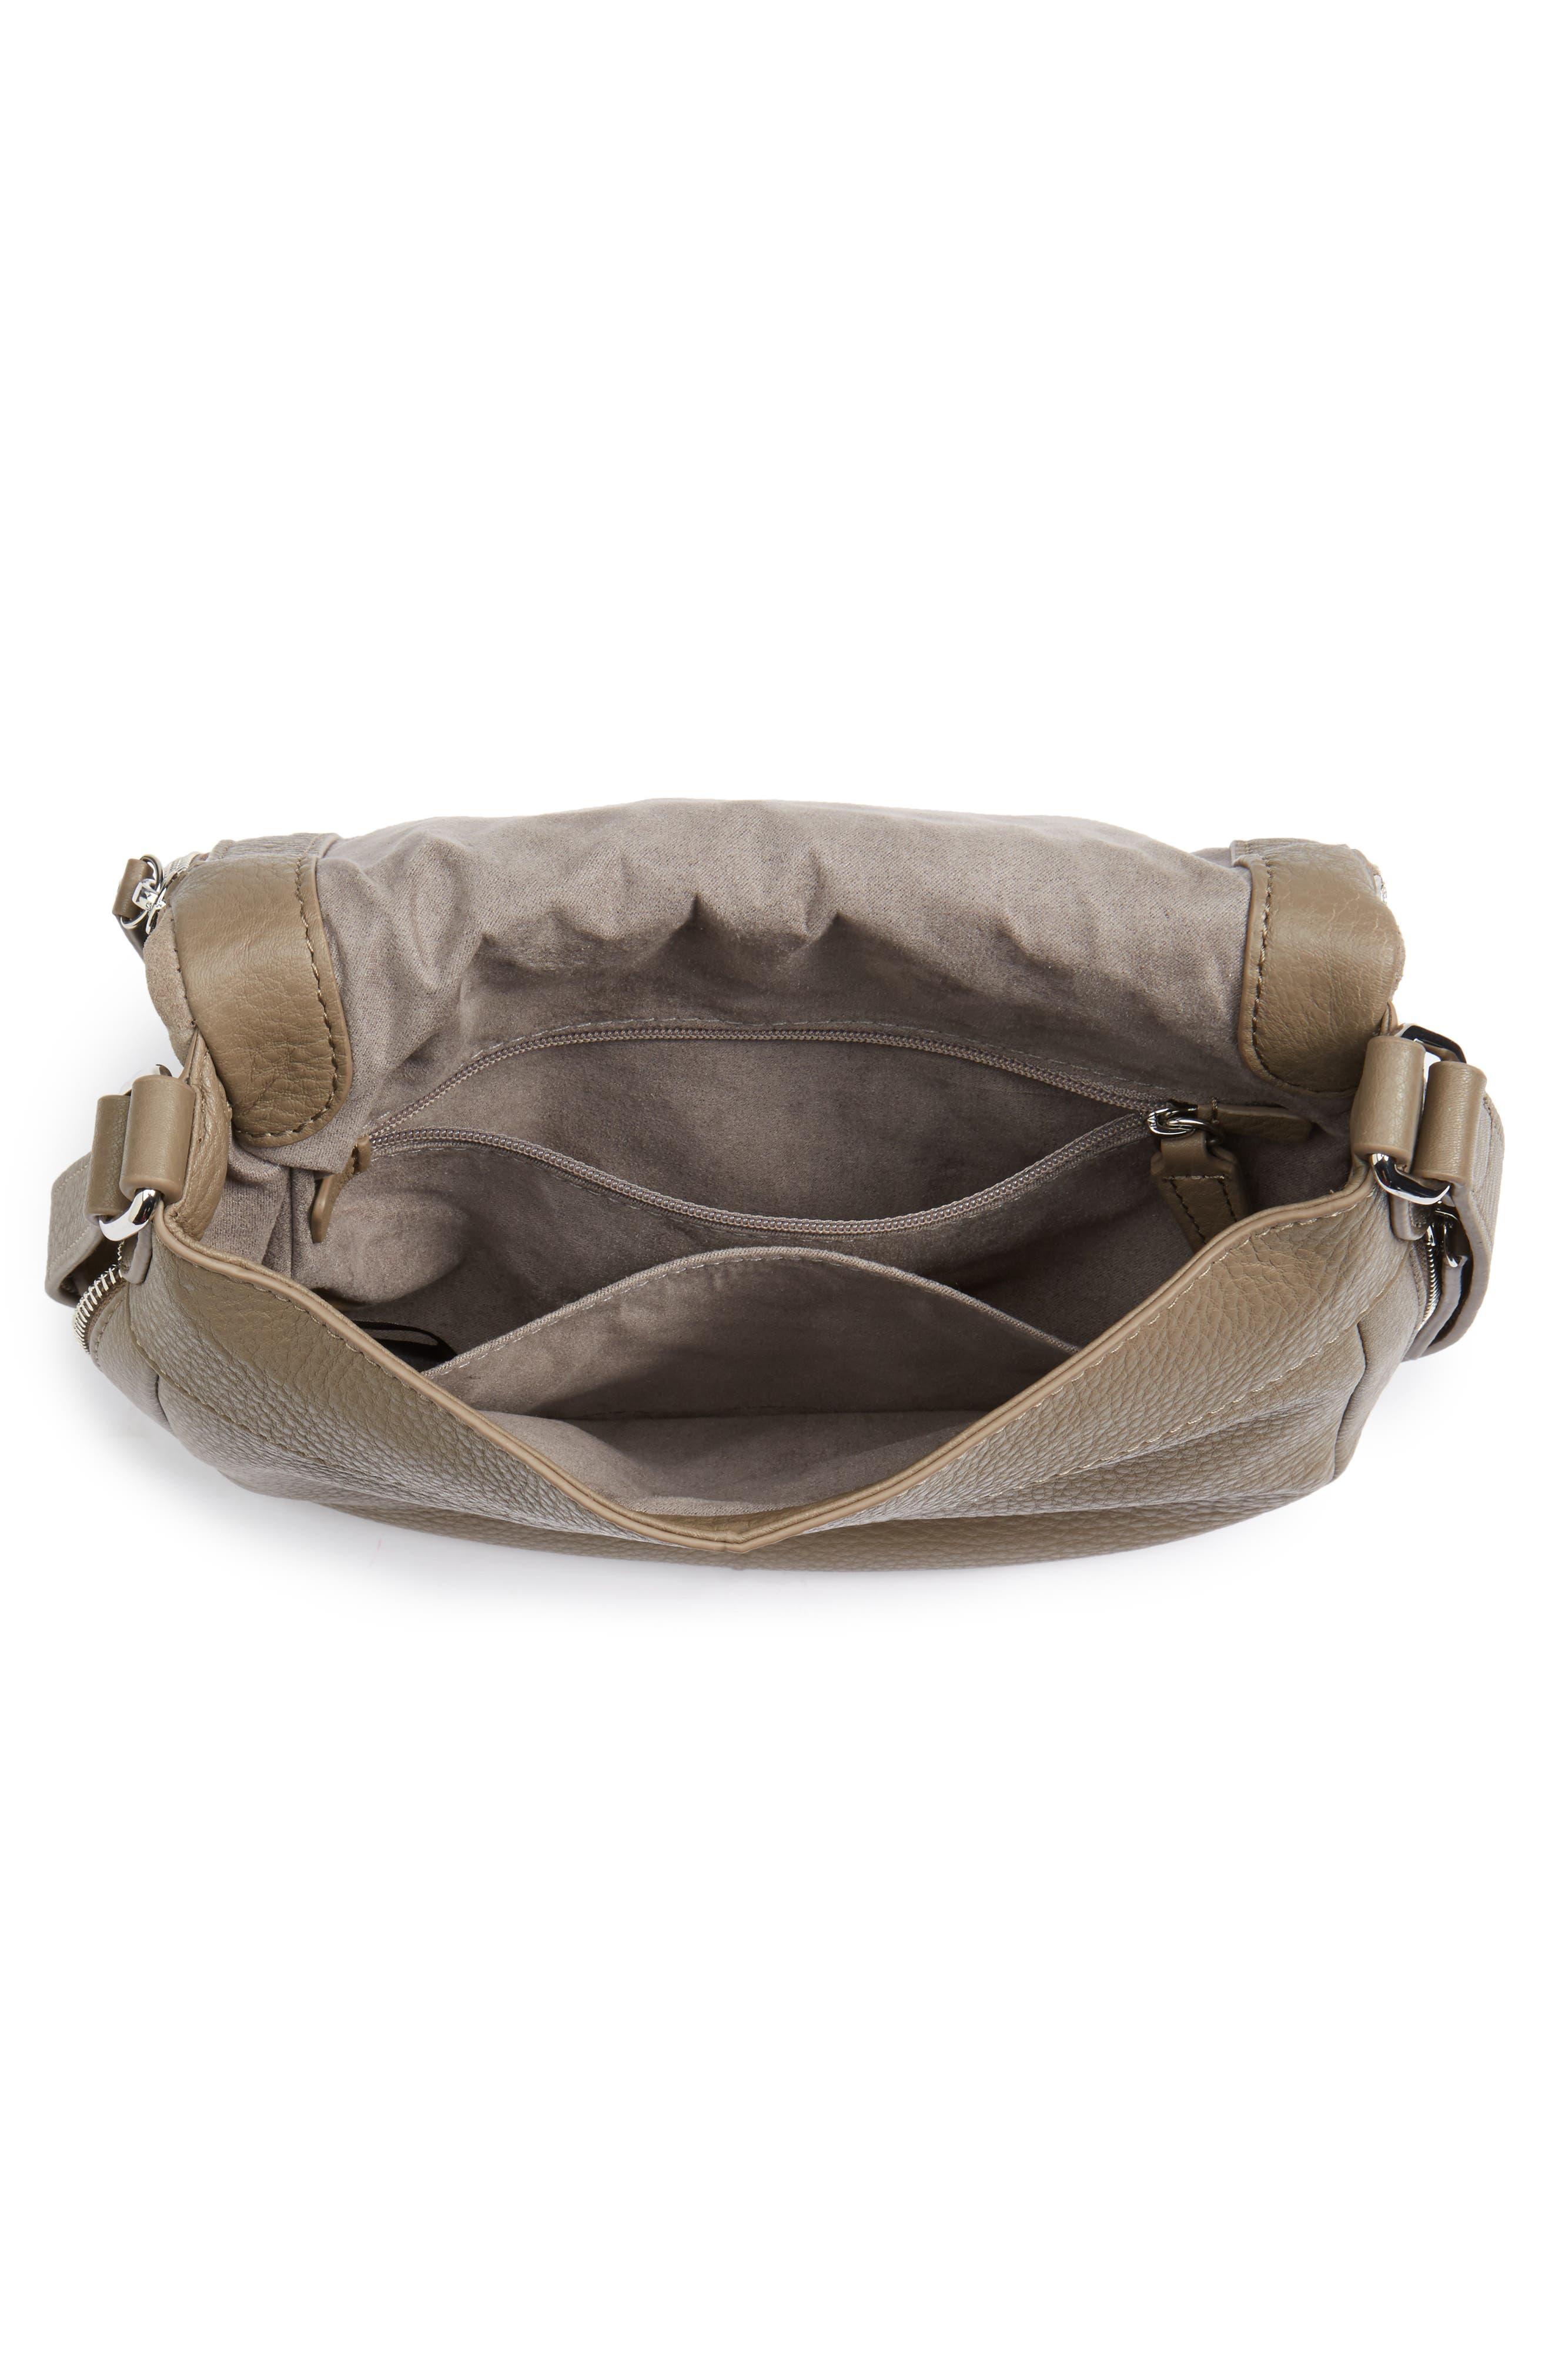 Bonny Studded Leather Crossbody Bag,                             Alternate thumbnail 8, color,